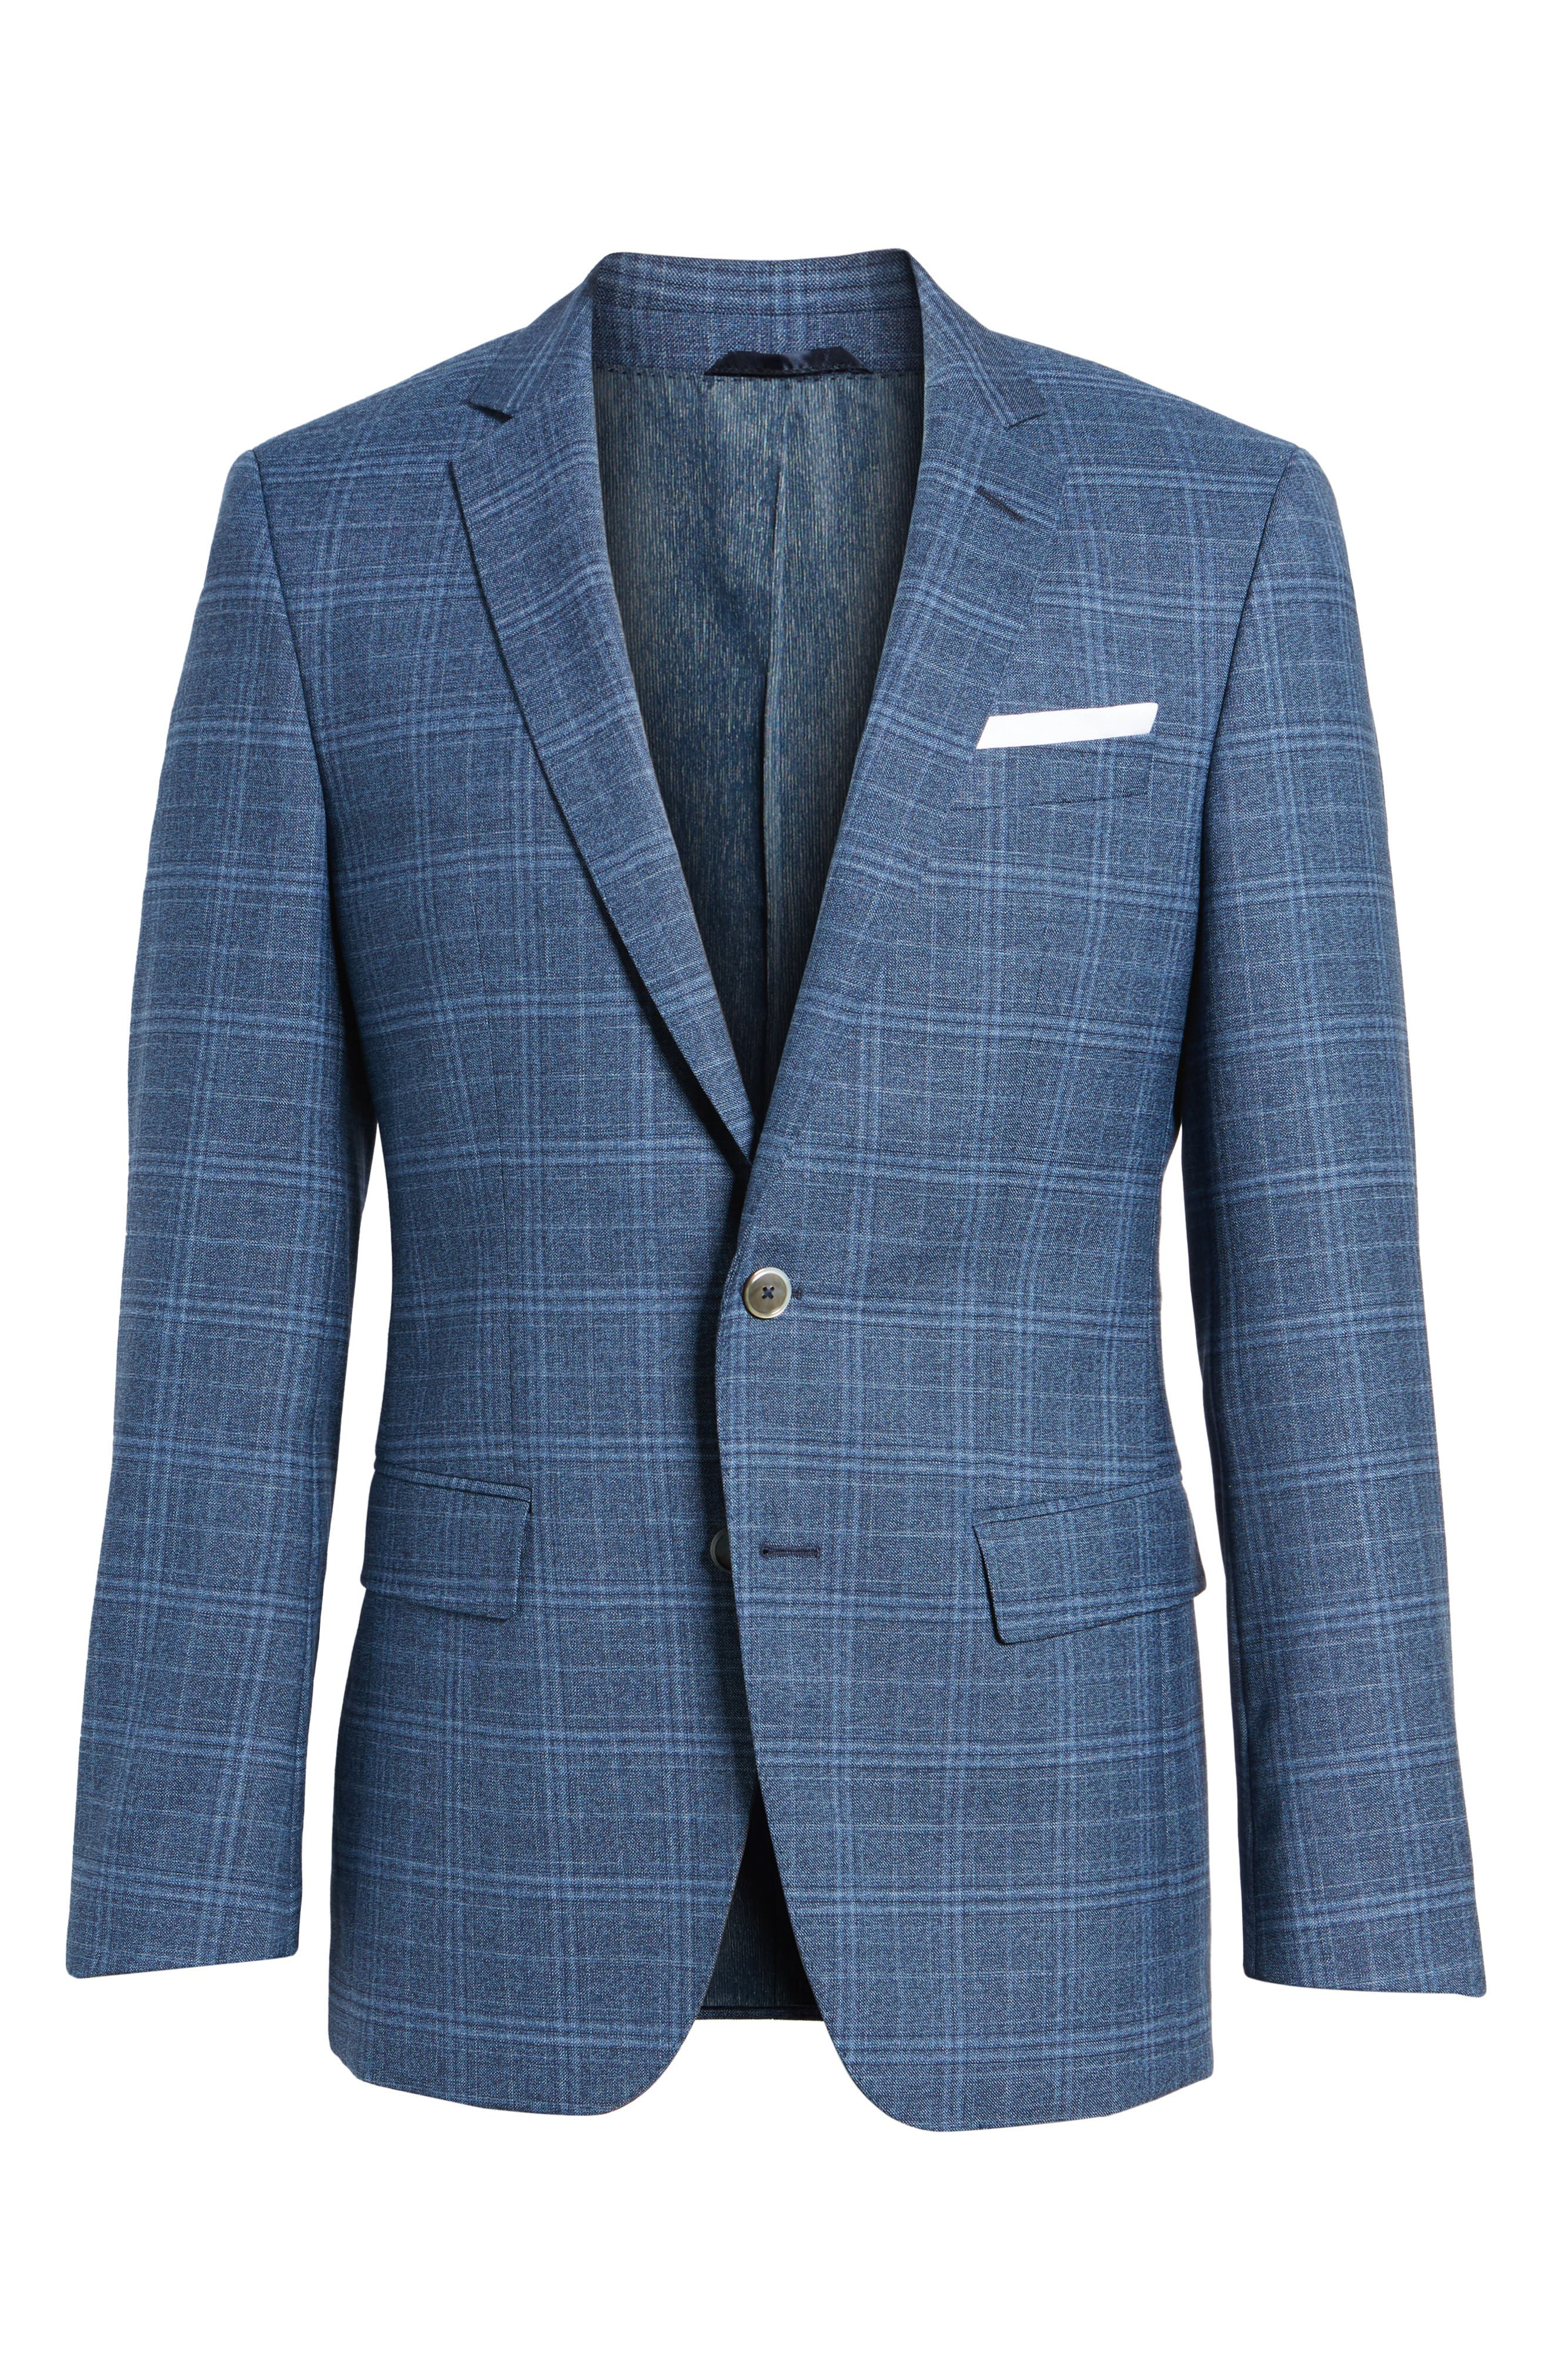 Hutsons Trim Fit Plaid Wool Sport Coat,                             Alternate thumbnail 6, color,                             Medium Blue/ Navy